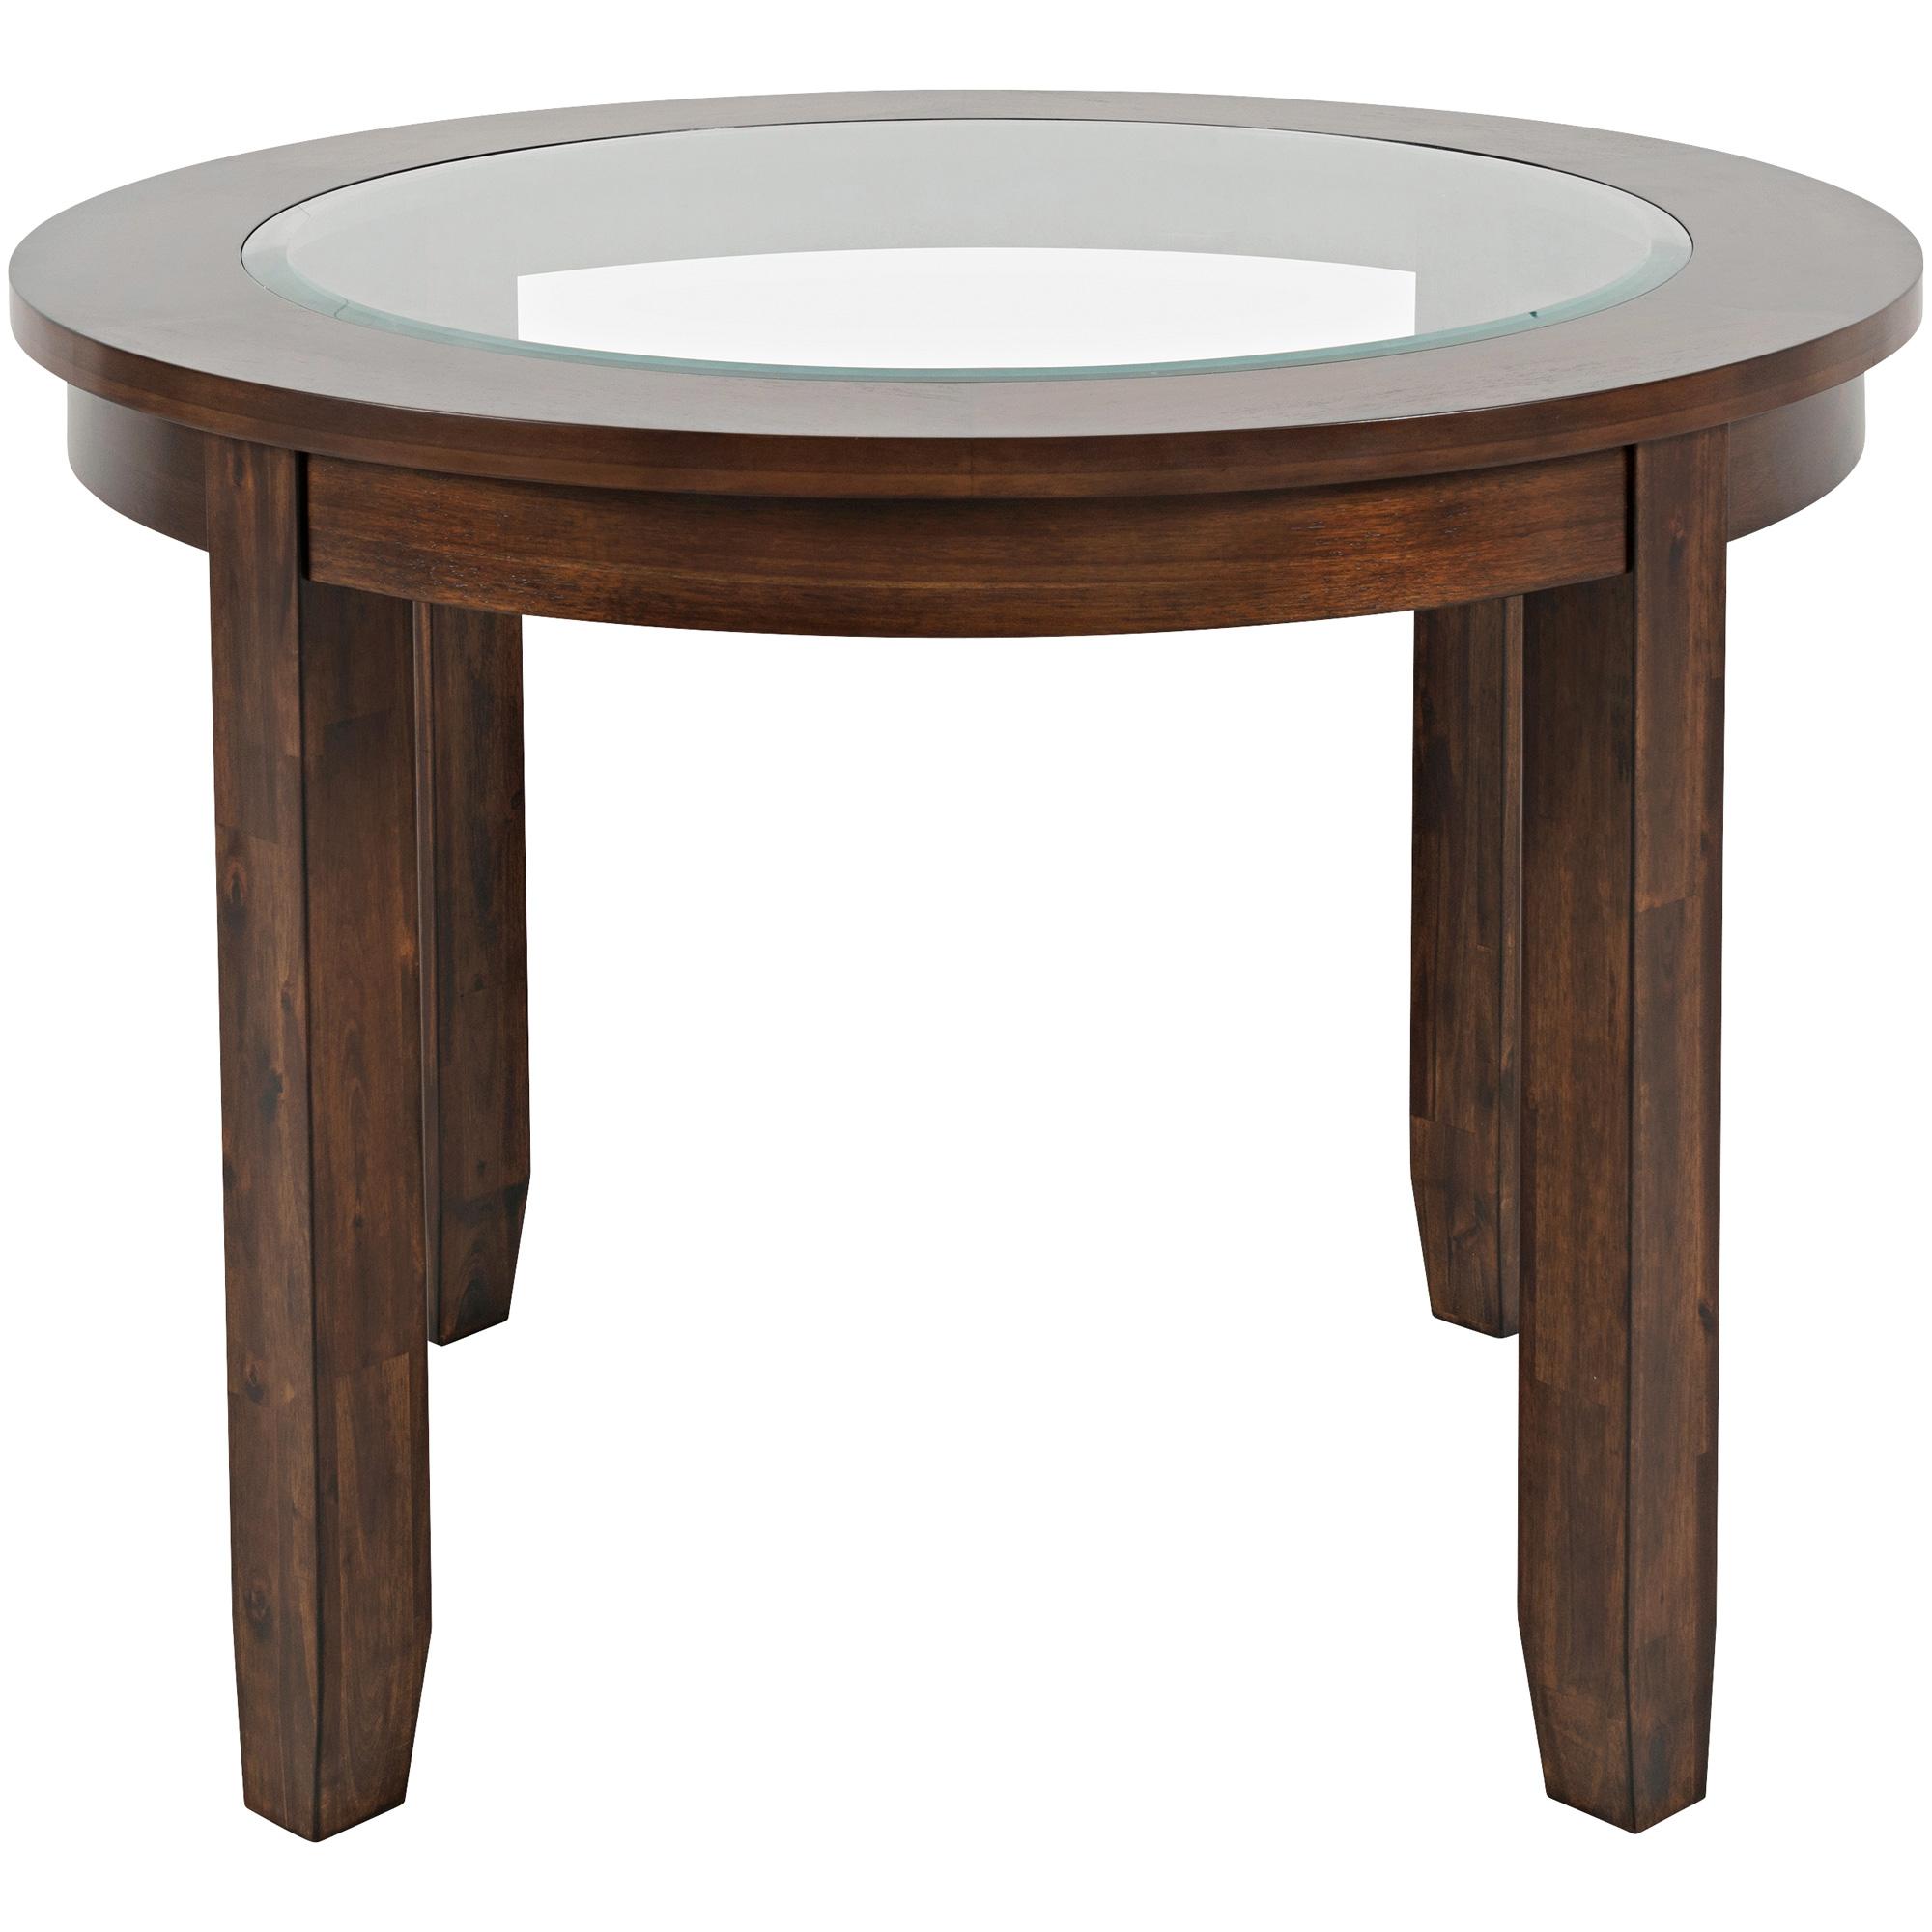 Jofran, Inc. | Urban Icon Merlot Round Dining Table